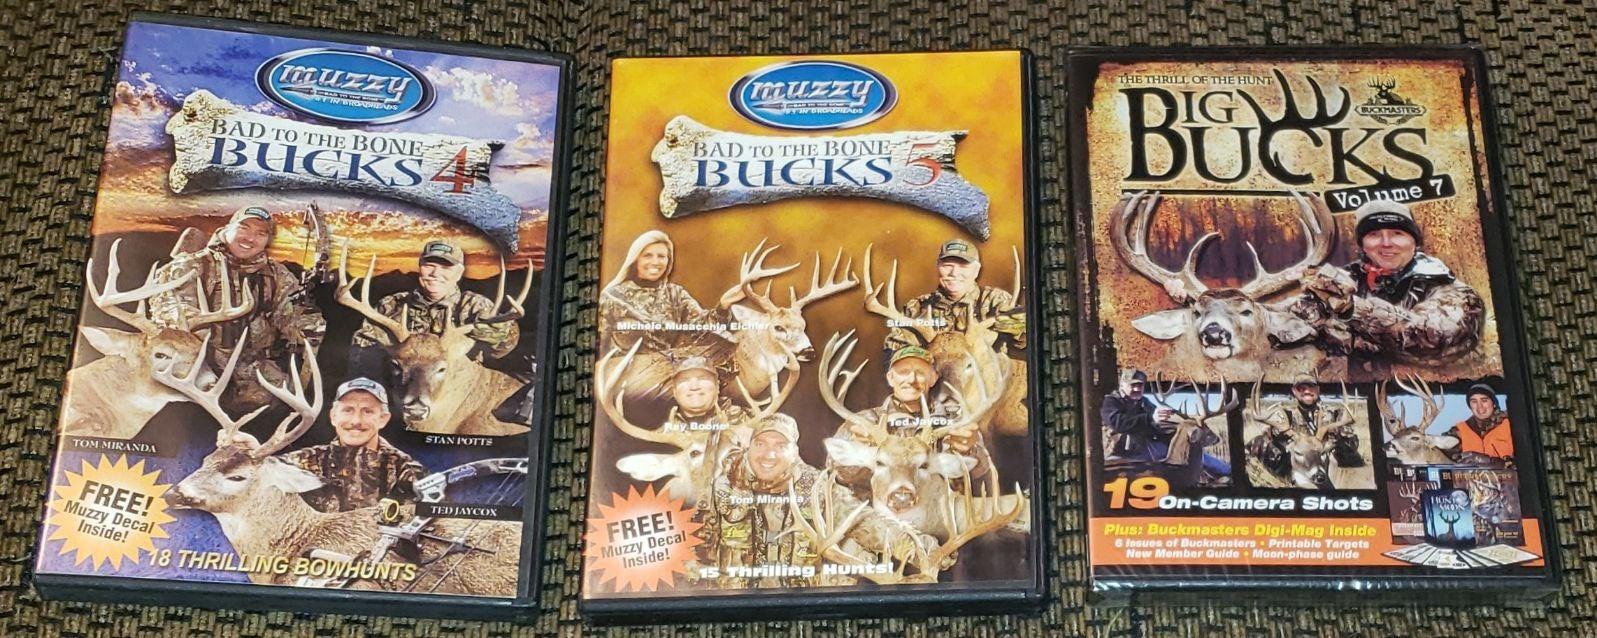 Bad To The Bone Bucks & Big Bucks DVD's